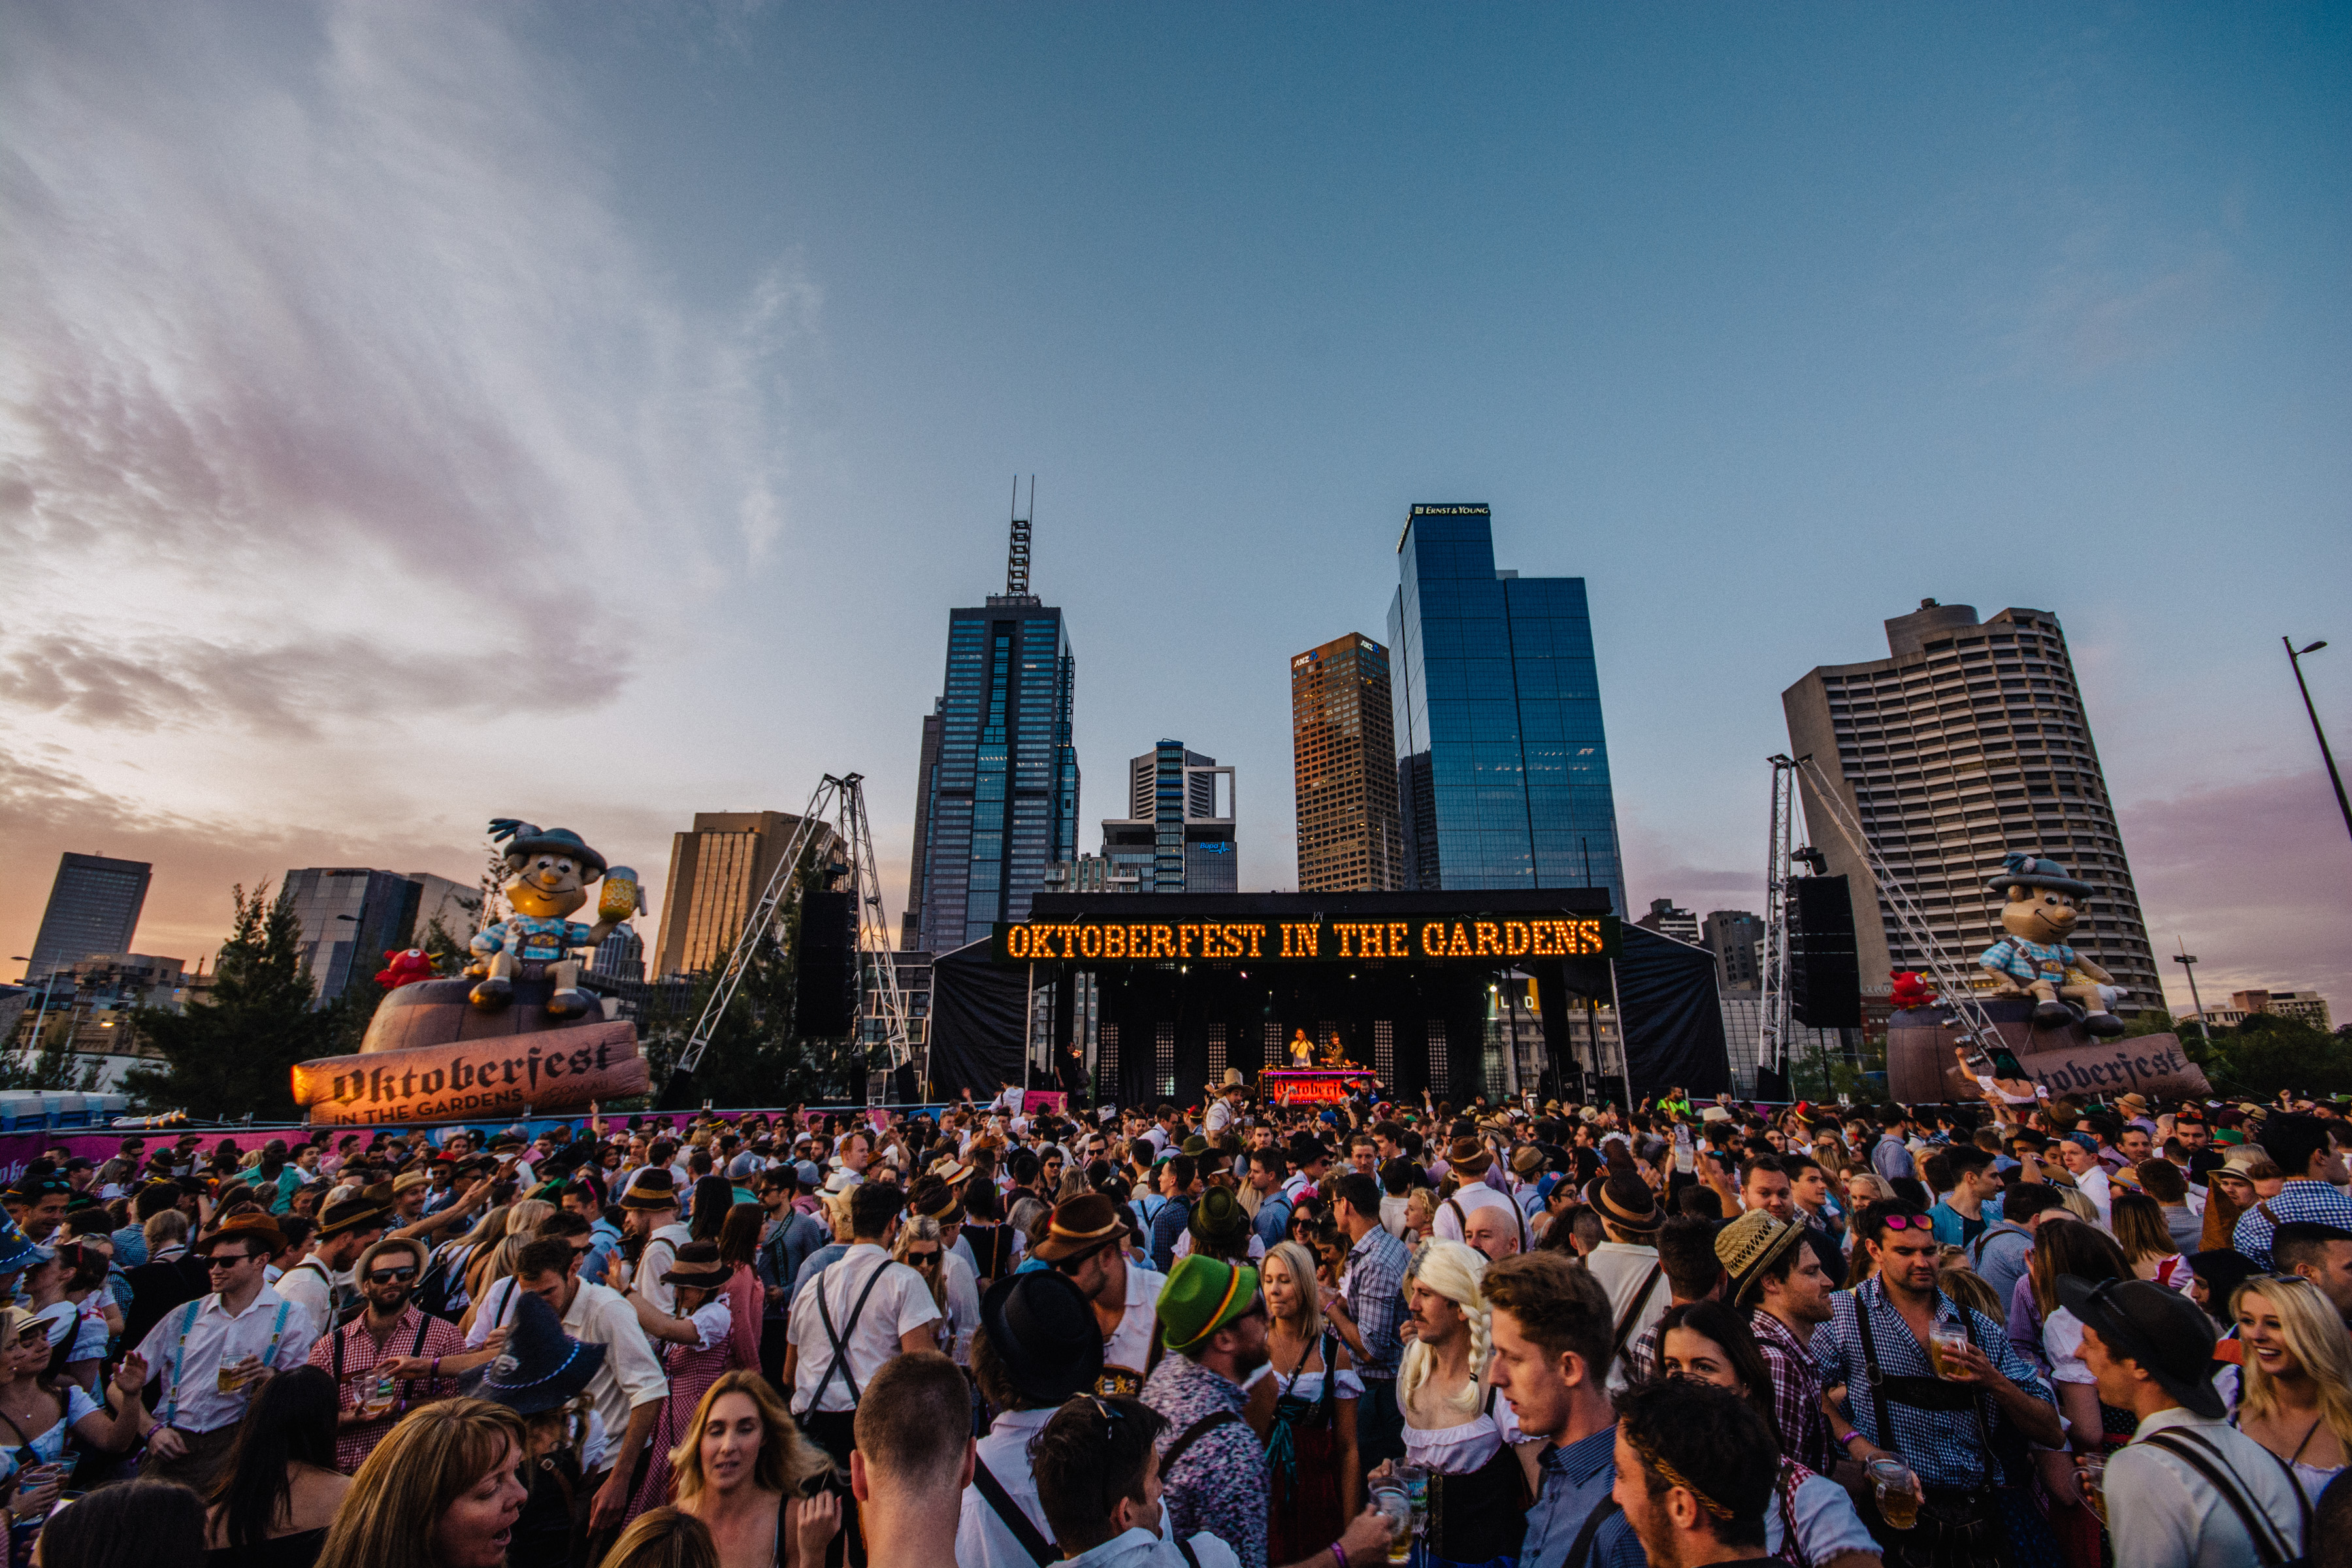 Oktoberfest in the Gardens 2016, Beer lovers unite for ...